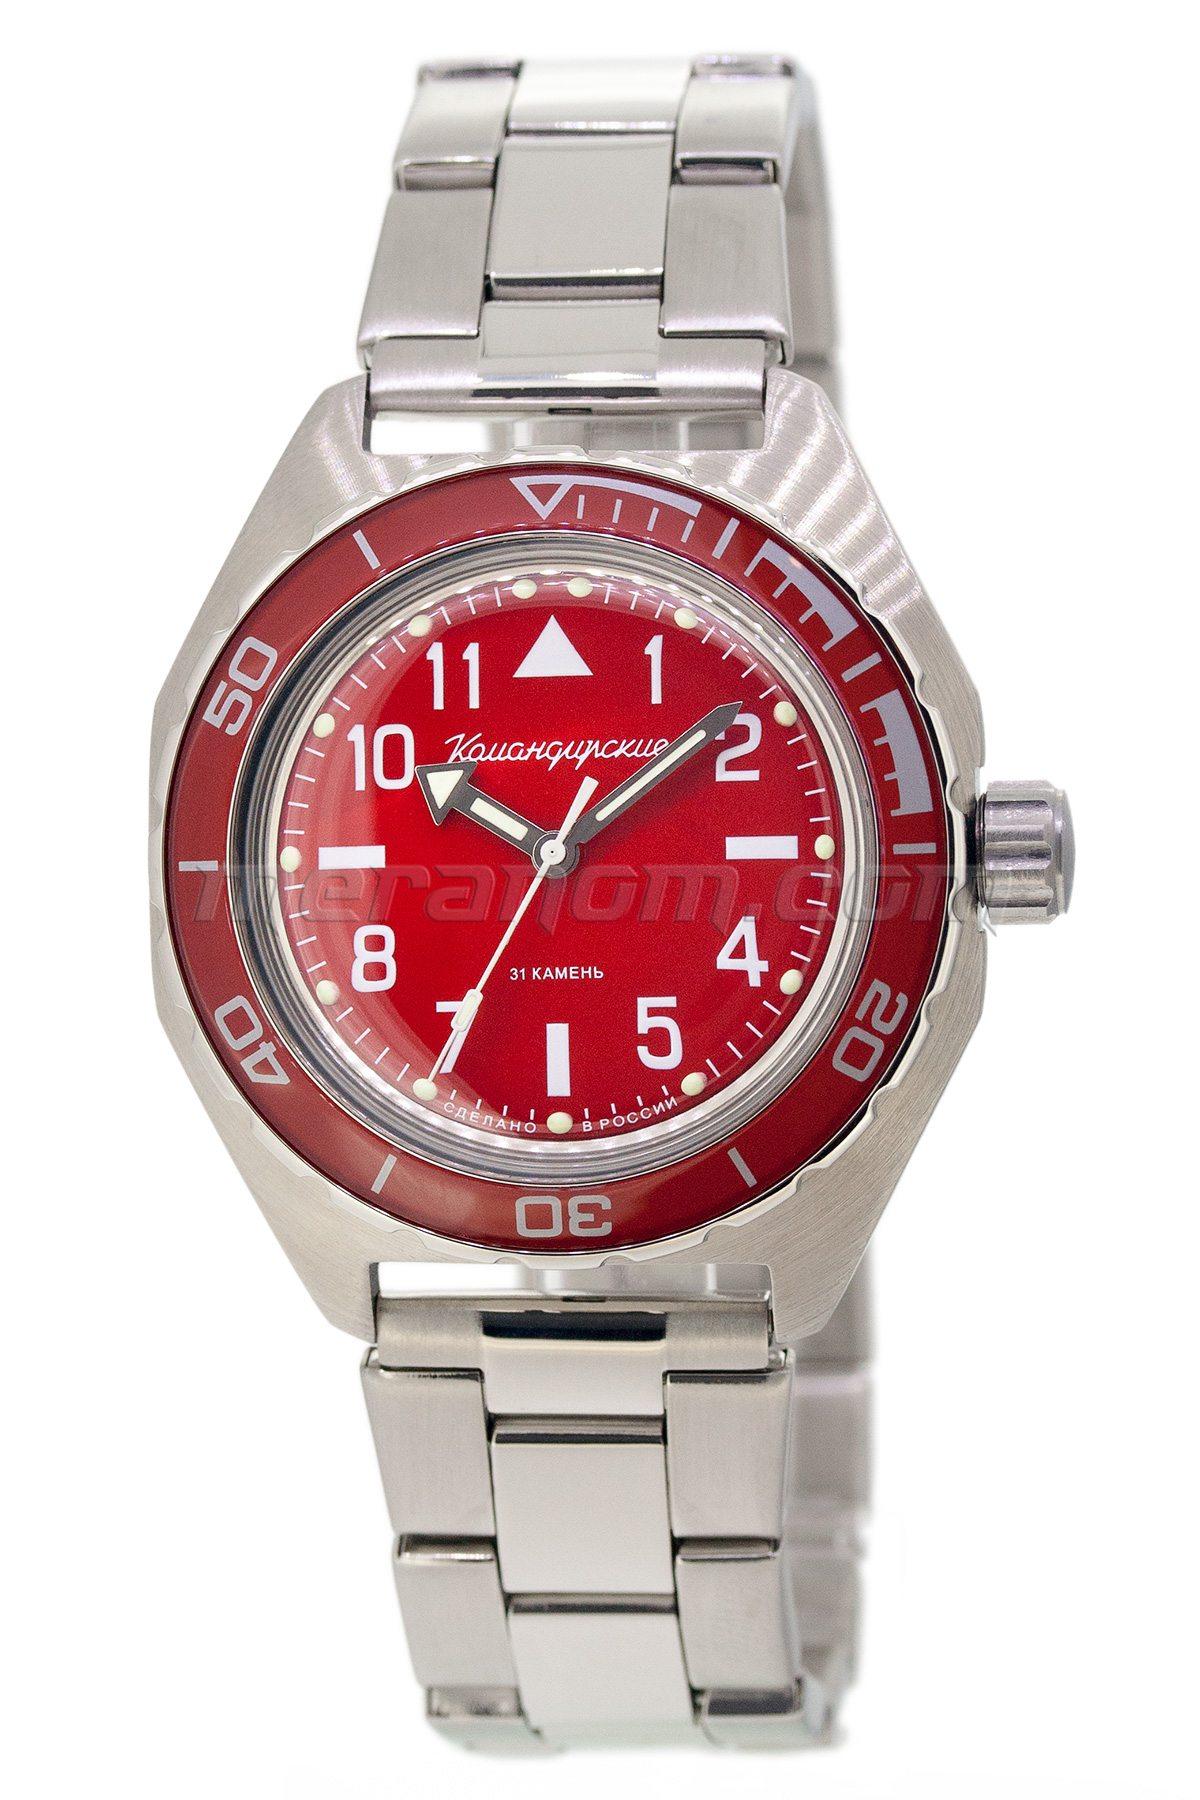 Vostok watch komandirskie 650840 buy from an authorized dealer for Komandirskie watches